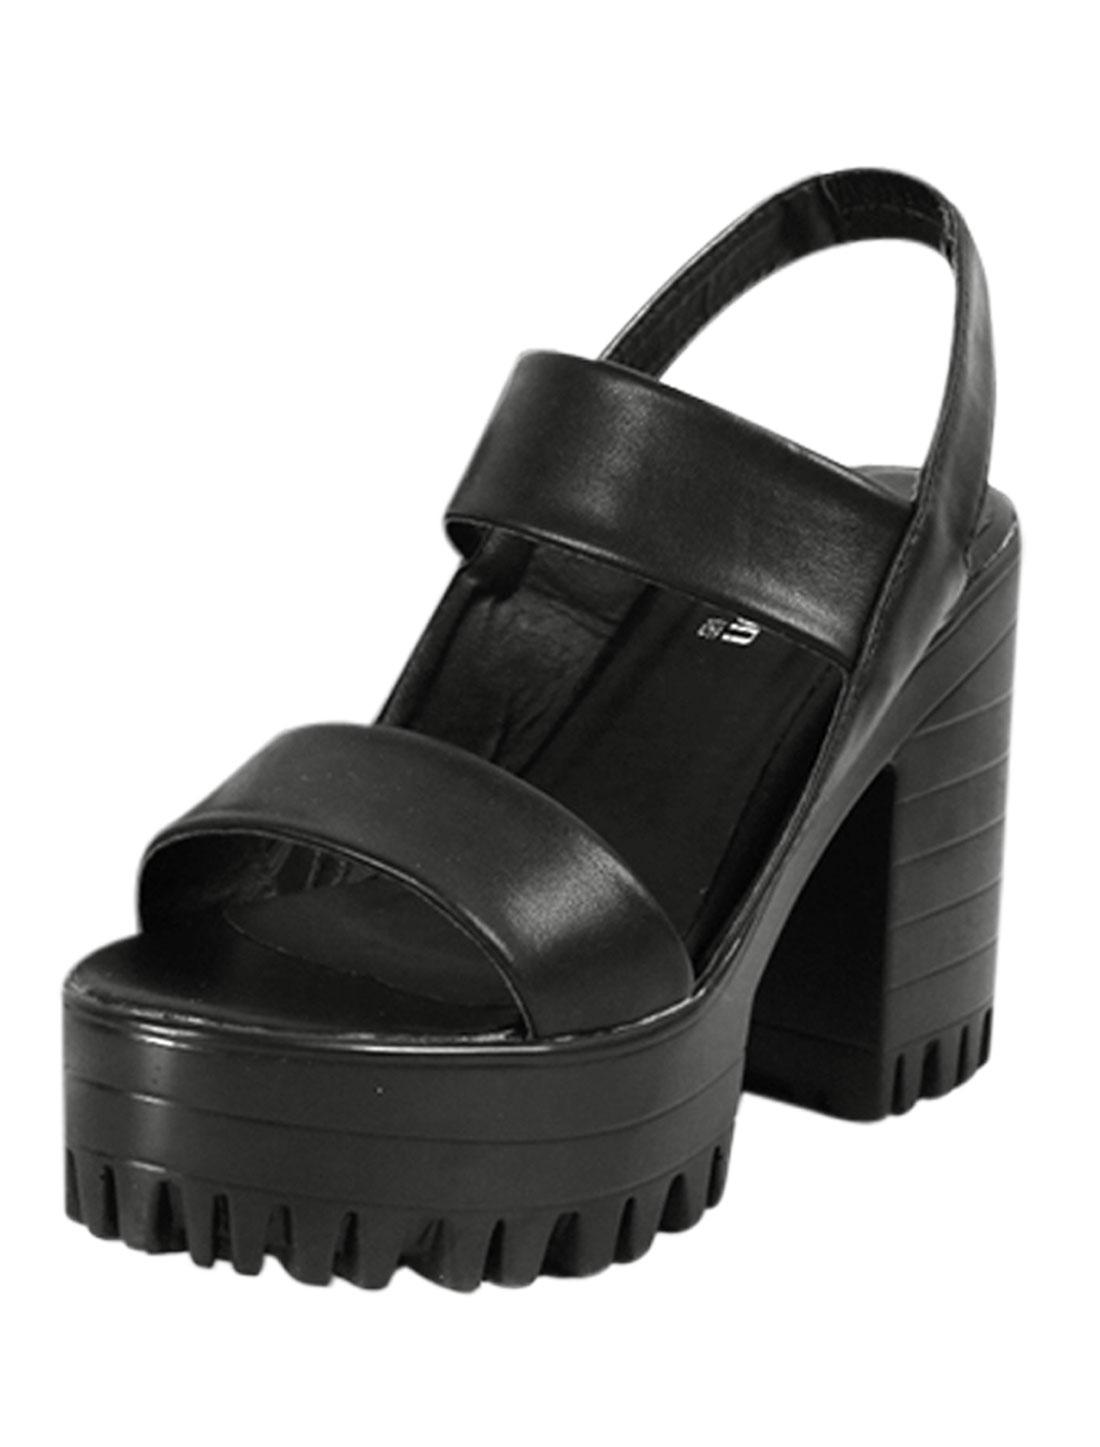 Ladies Ankle Strap Summer Relaxed Platform Sandals Black US 6.5